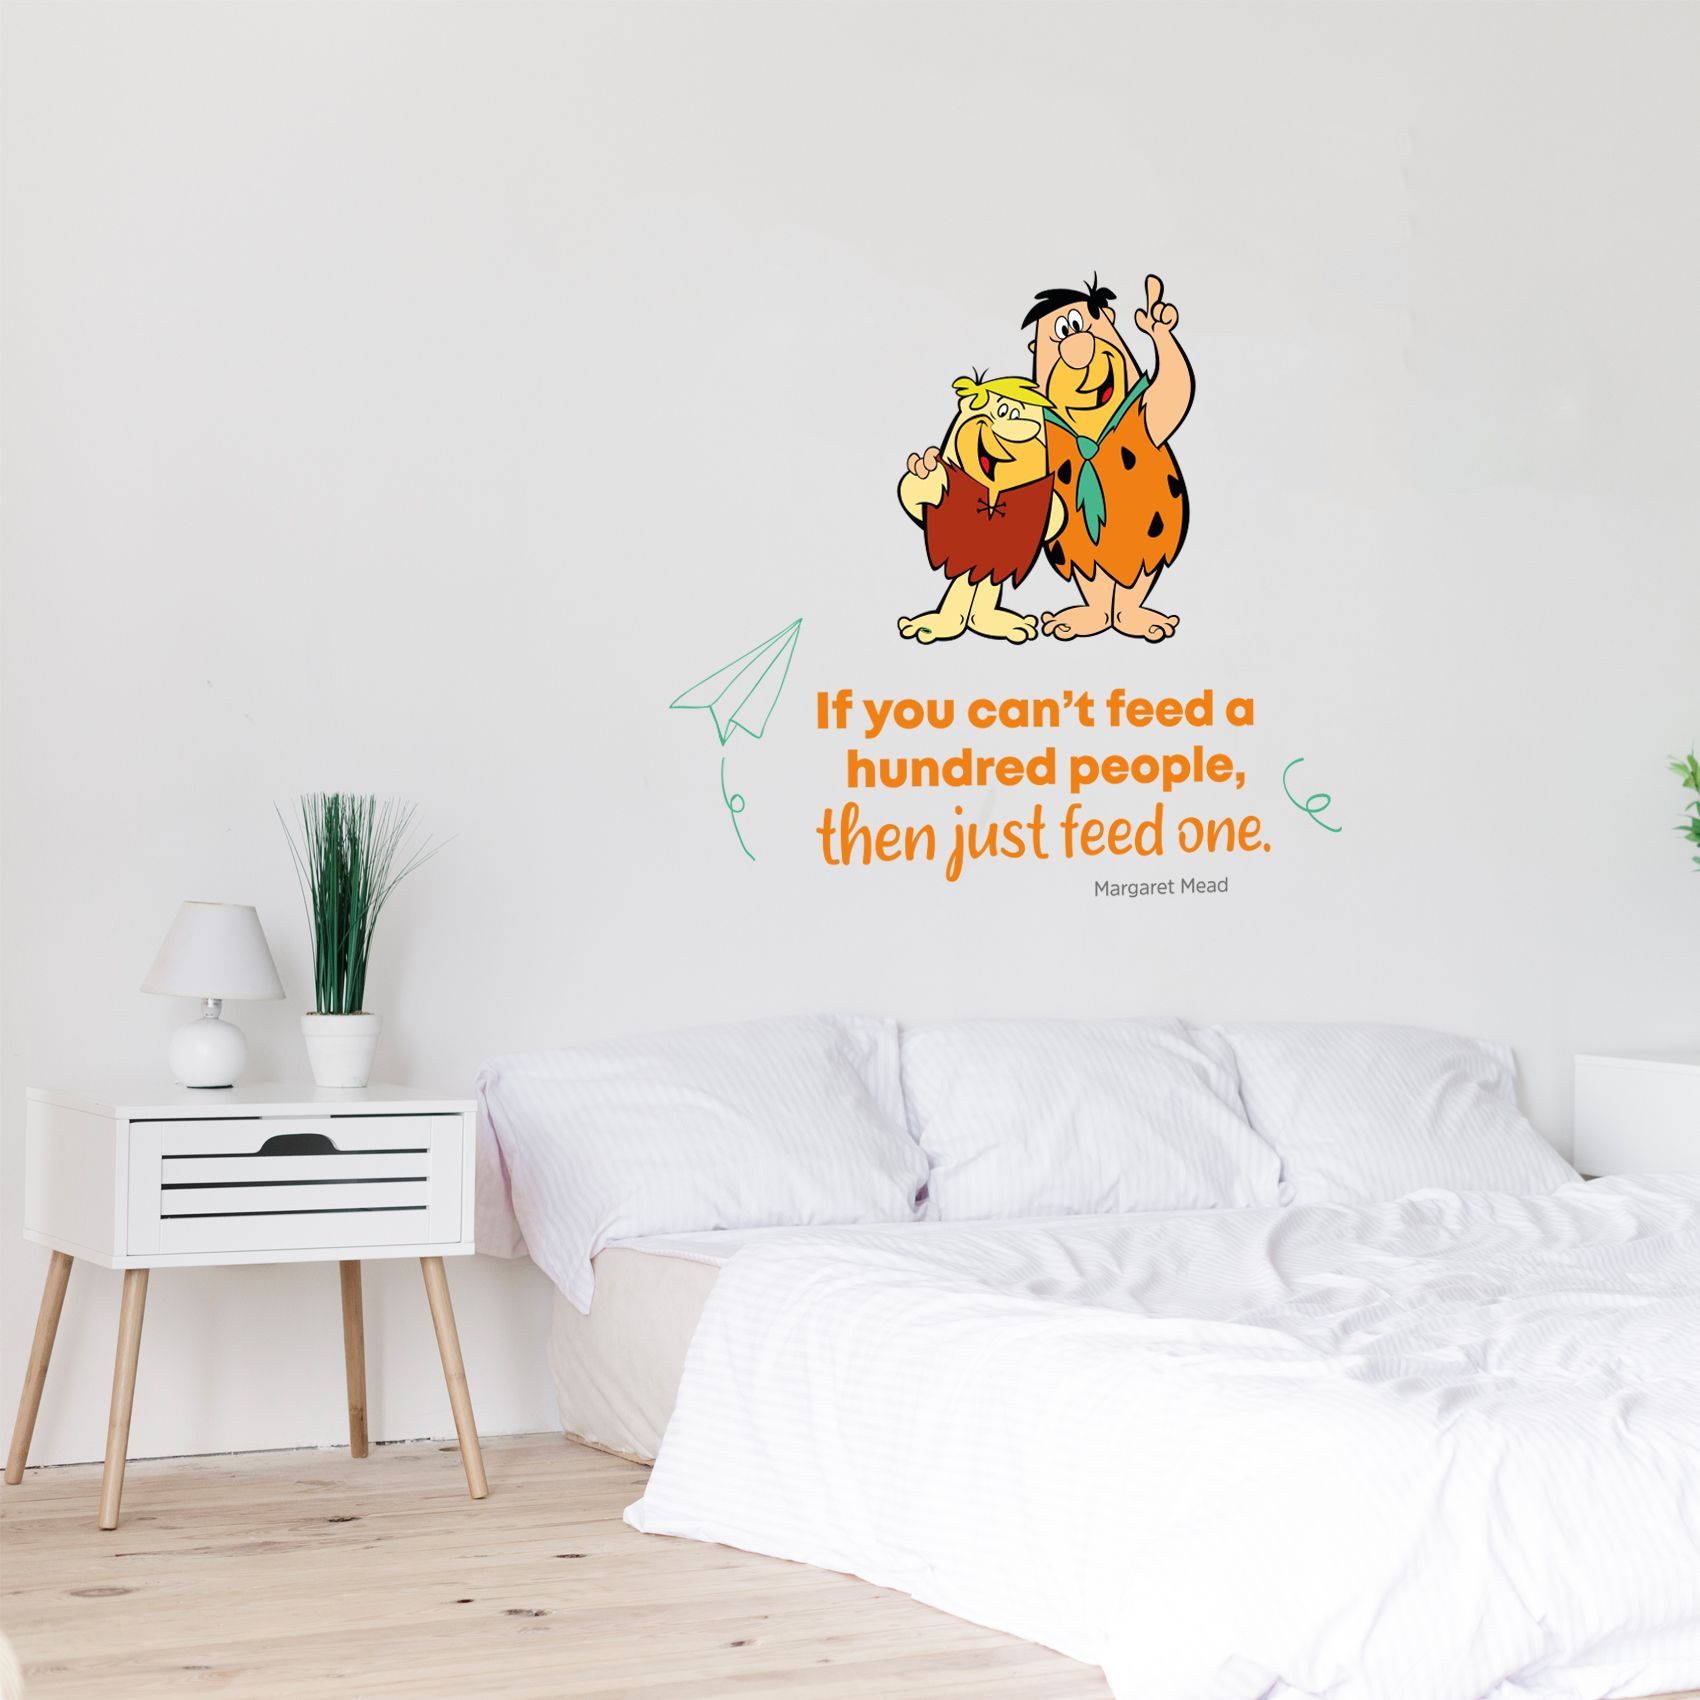 Feed One Flintstones Life Quote Cartoon Quotes Decors Wall Sticker Art Design Decal For Girls Boys Kids Room Bedroom Nursery Kindergarten Home Decor Stickers Wall Art Vinyl Decoration 20x18 Inch Walmart Com